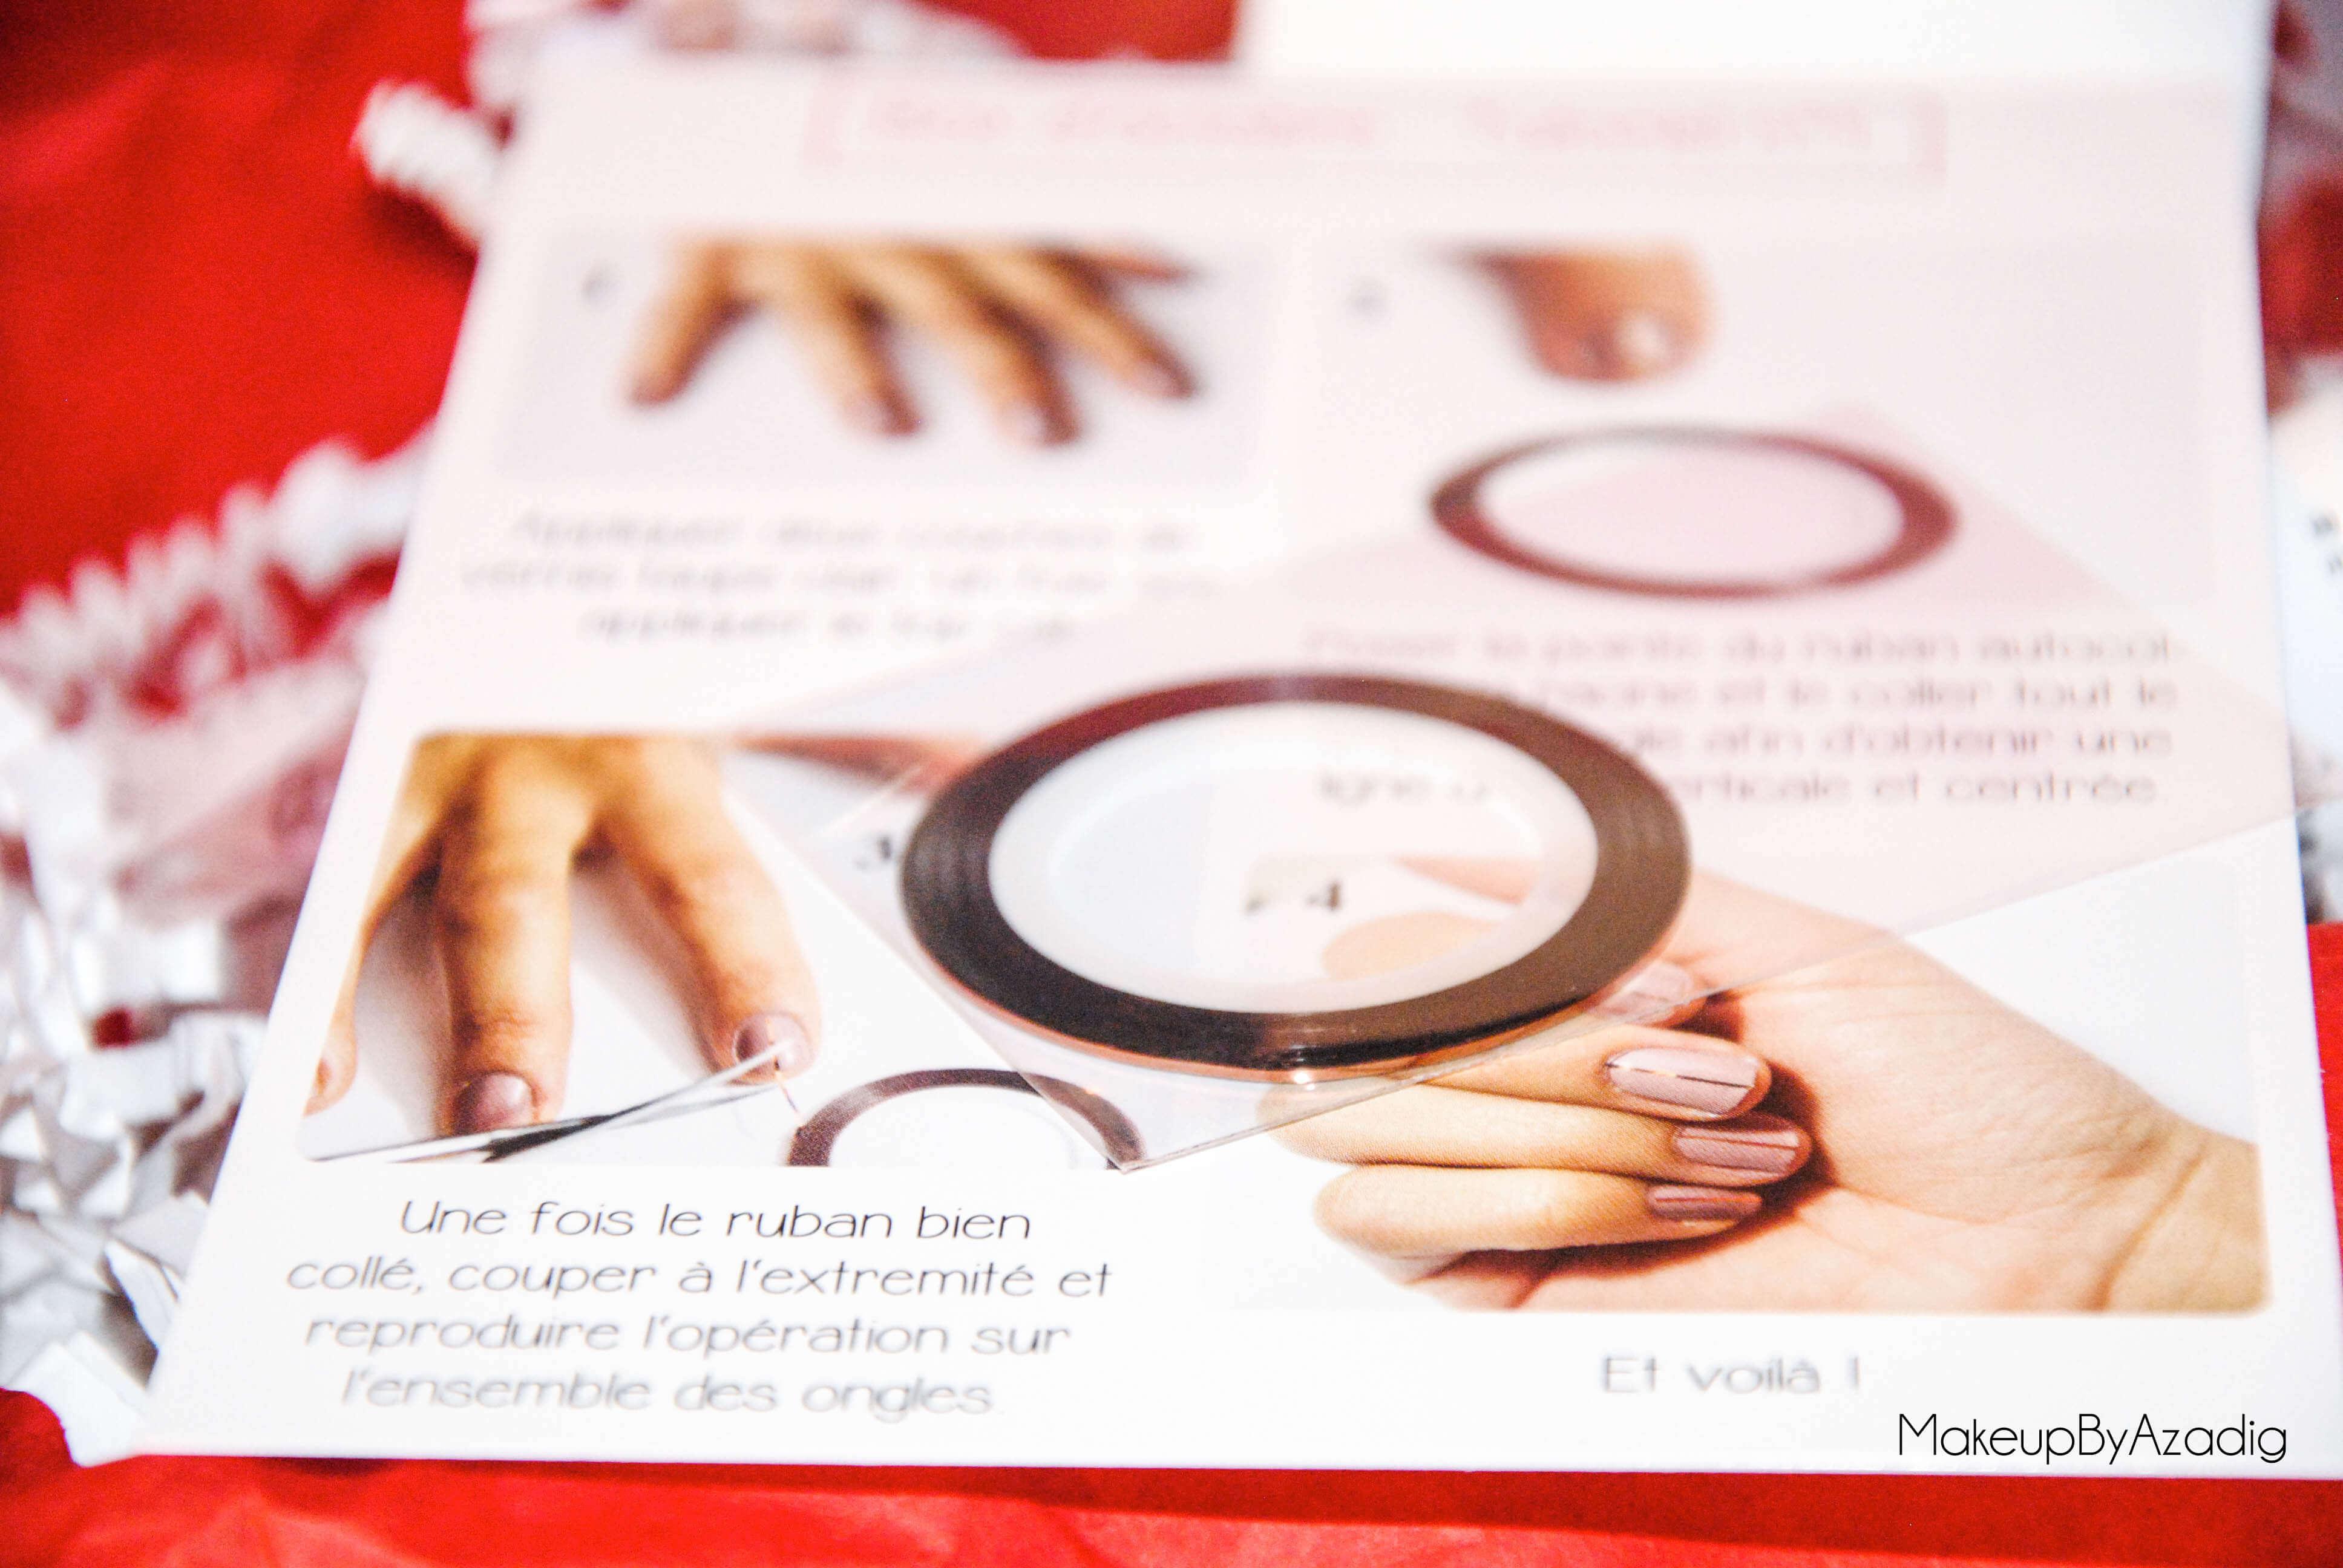 popmynails-makeupbyazadig-box-beaute-vernis-nails-troyes-paris-revue-avis-prix-nailart